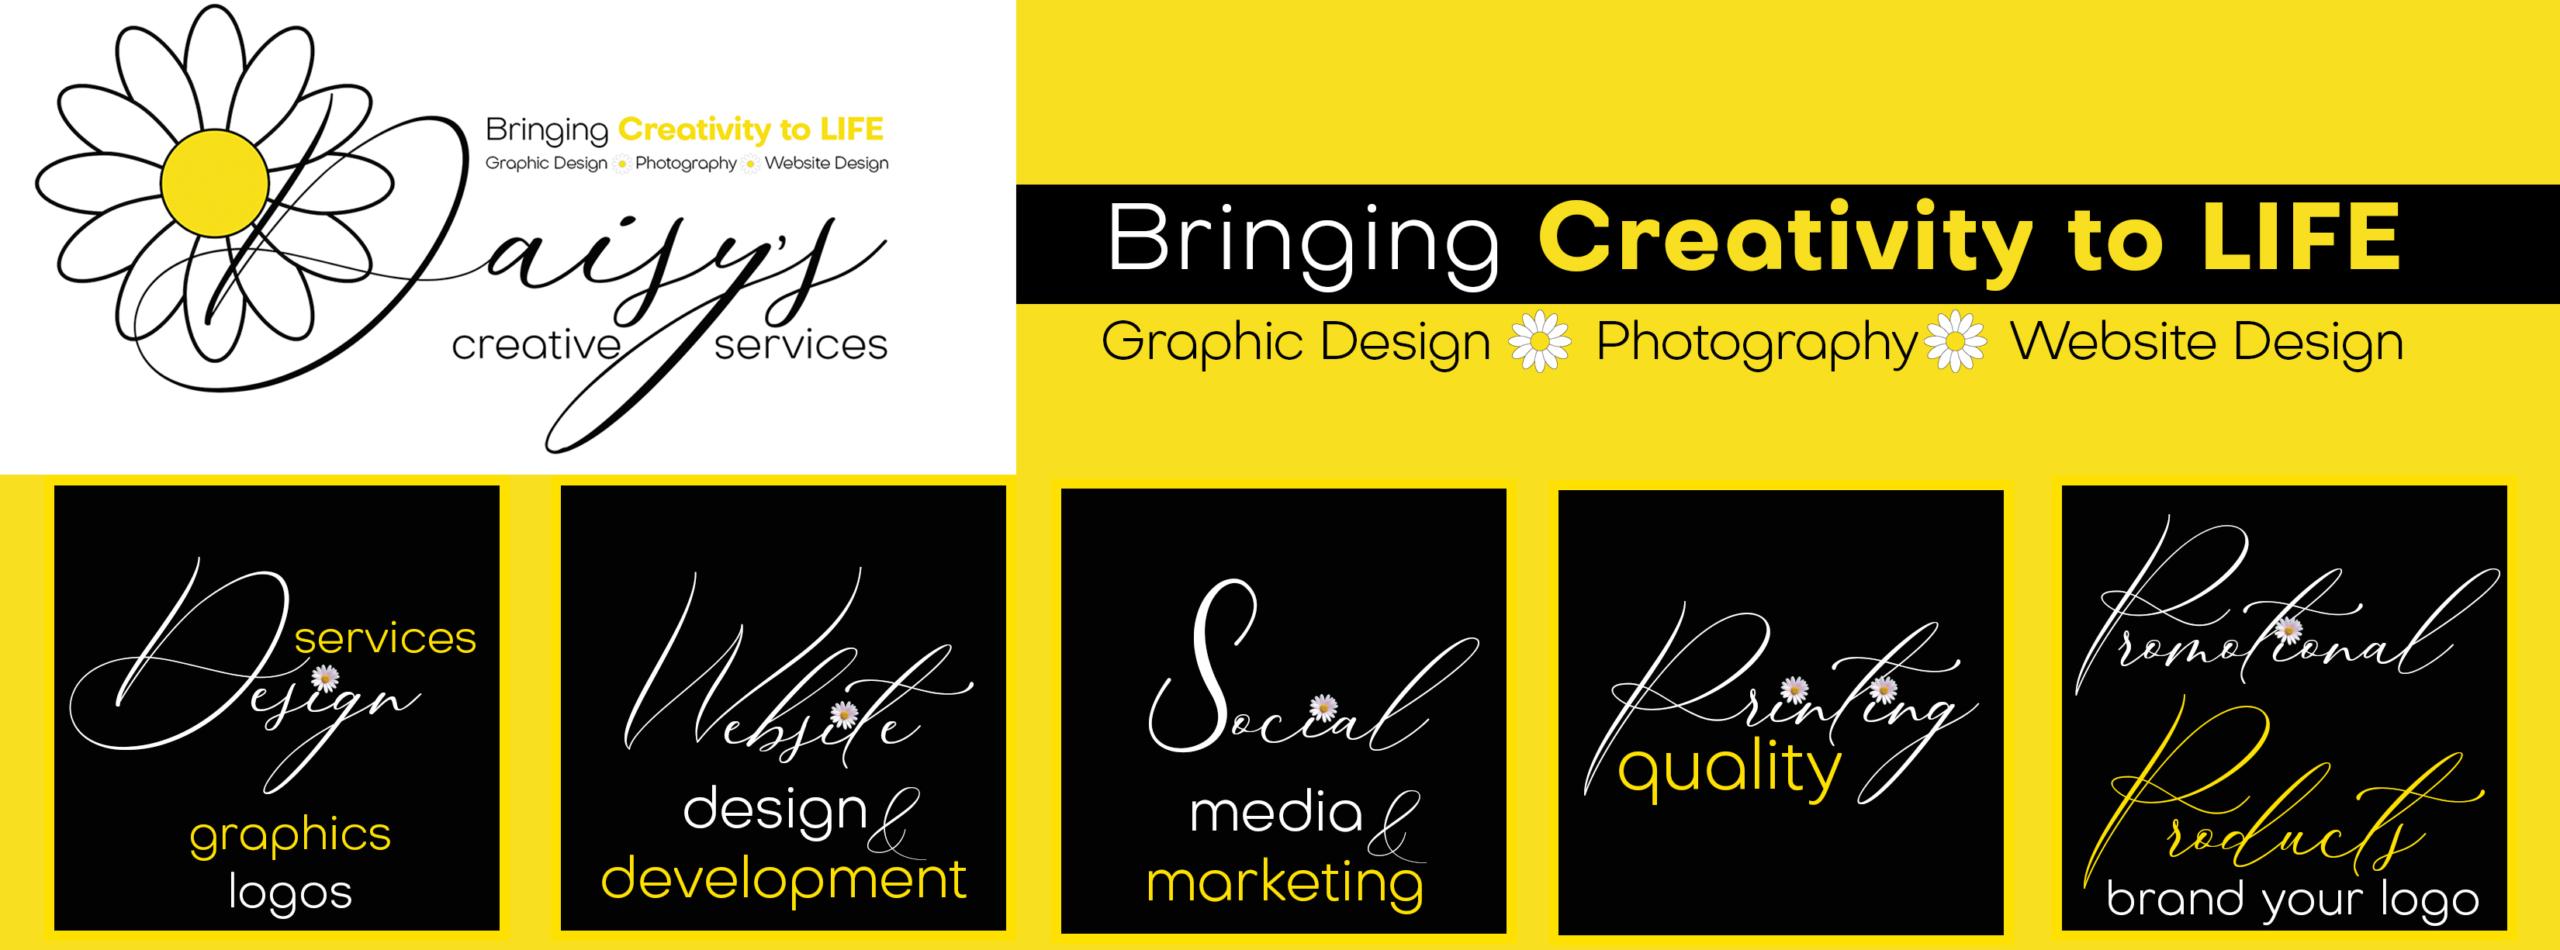 Daisy's Creative Services